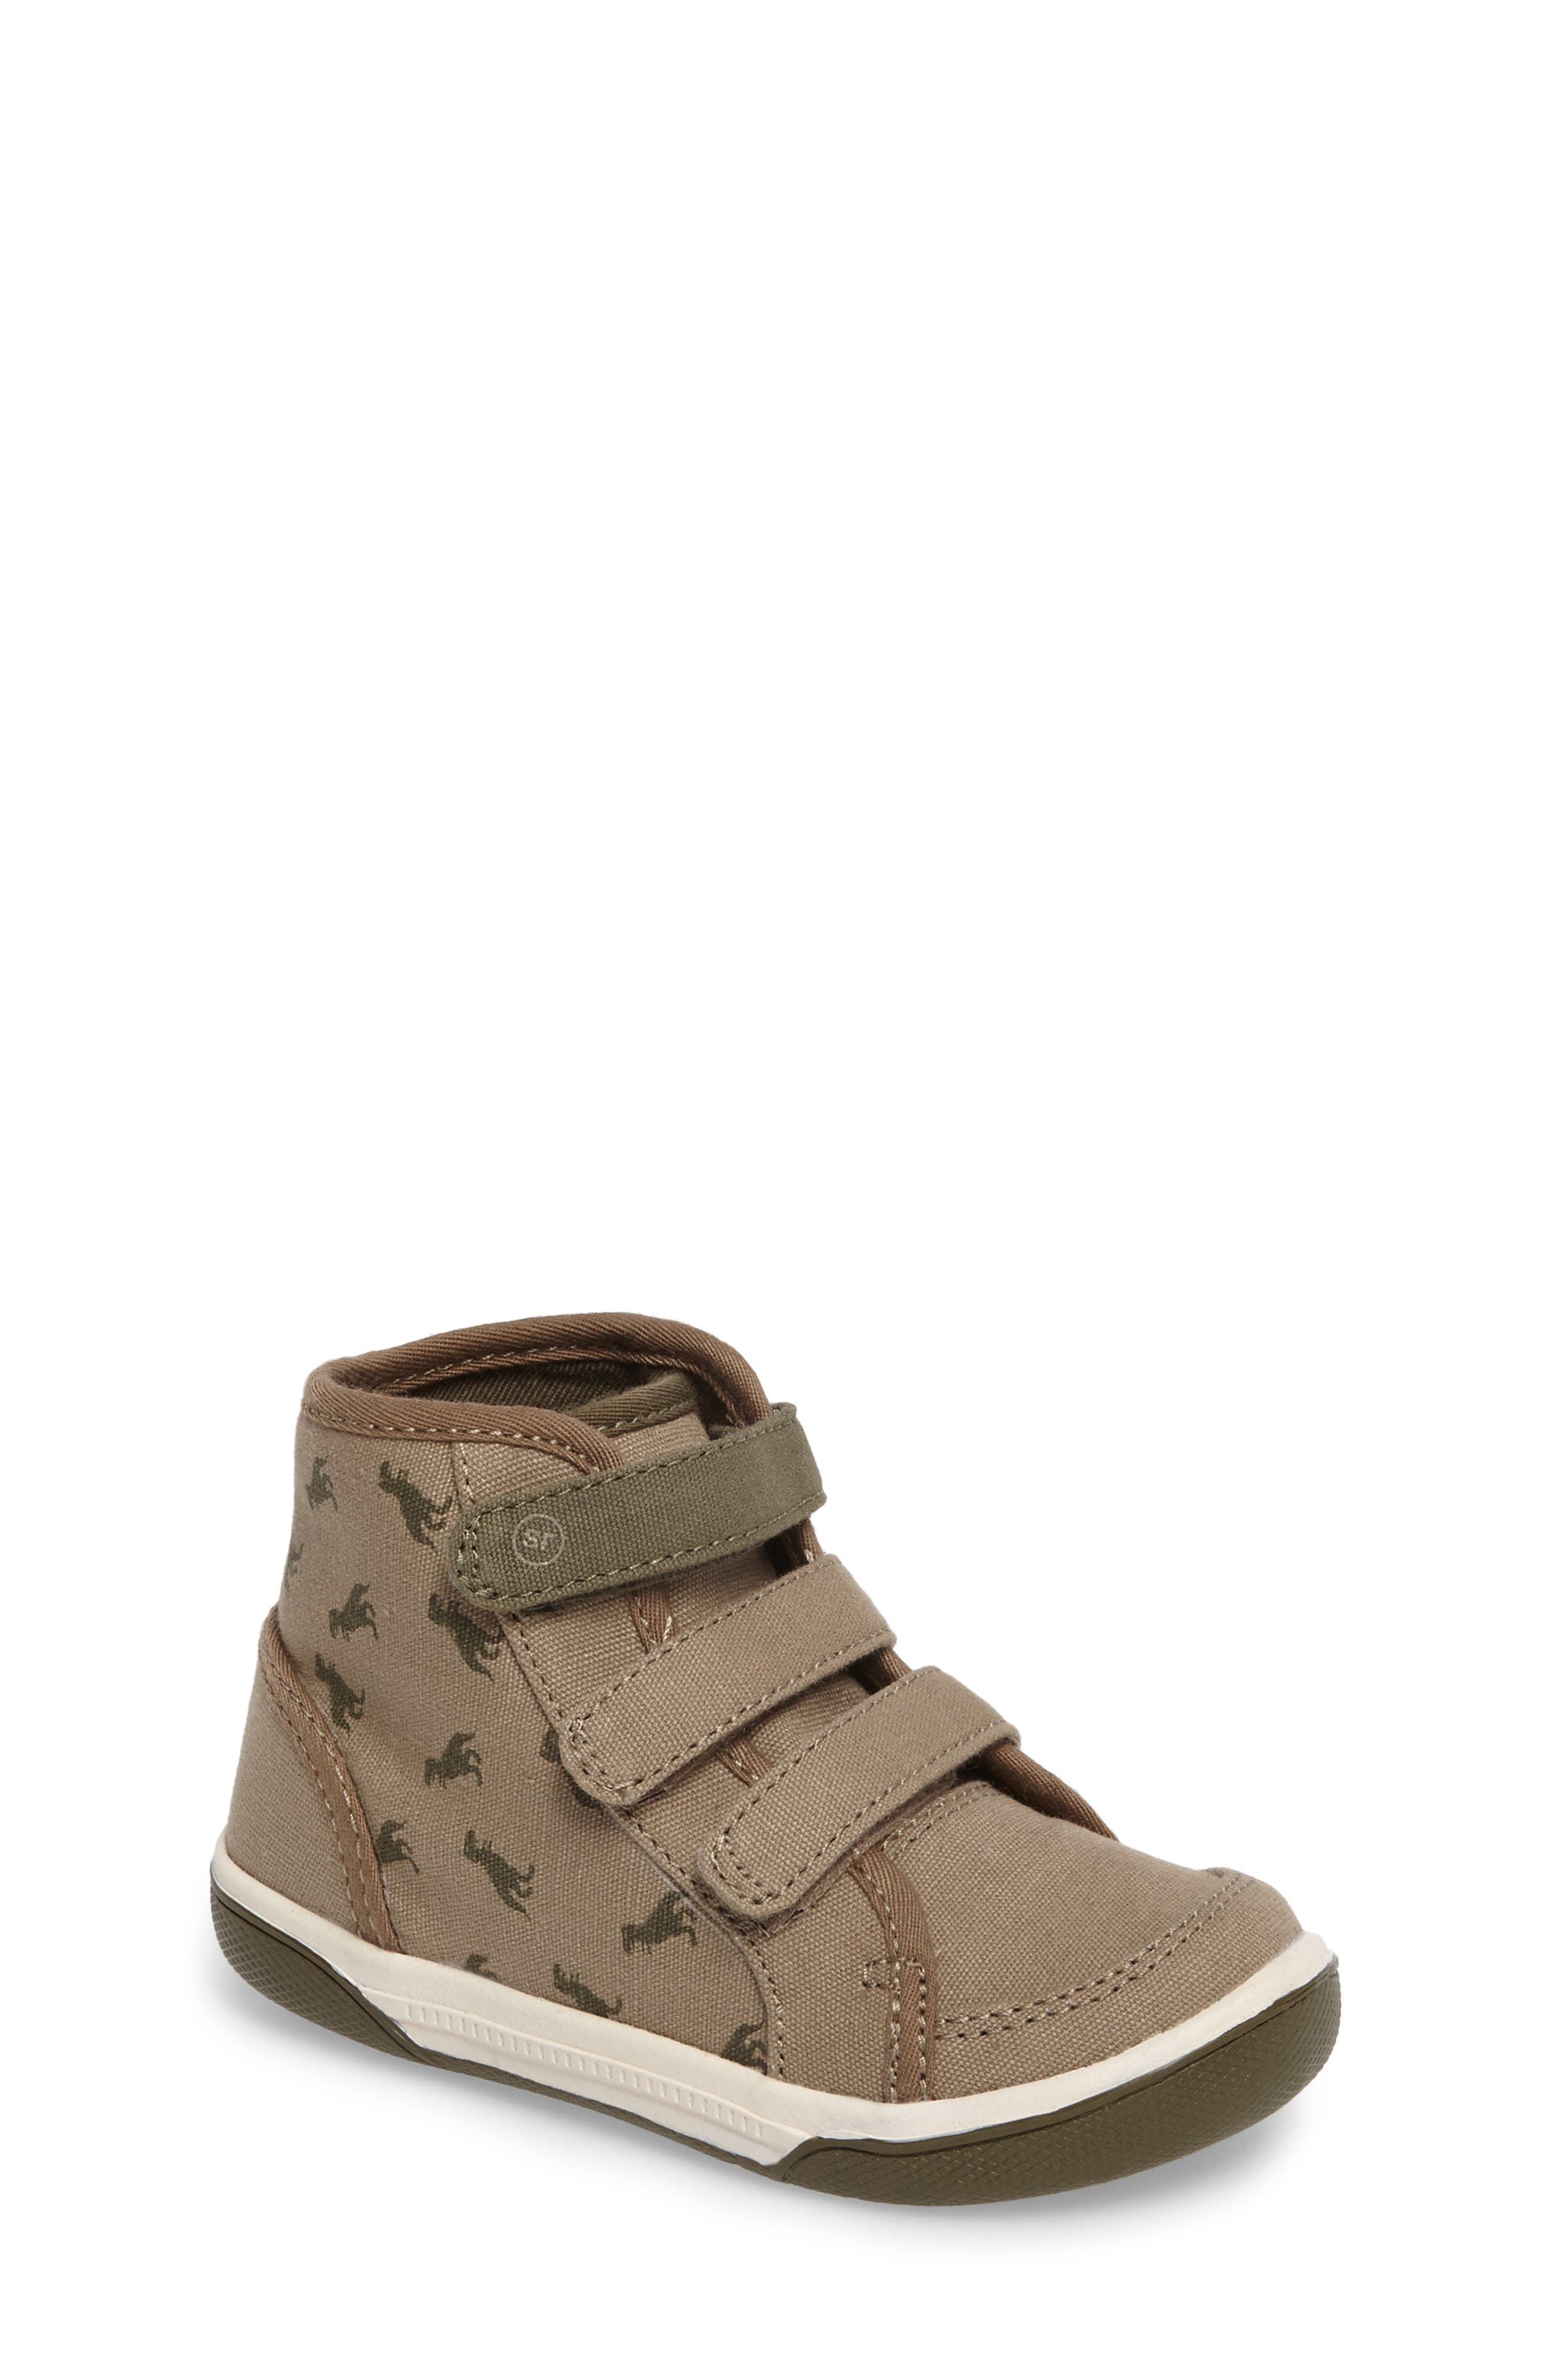 STRIDE RITE Ellis T-Rex High Top Sneaker